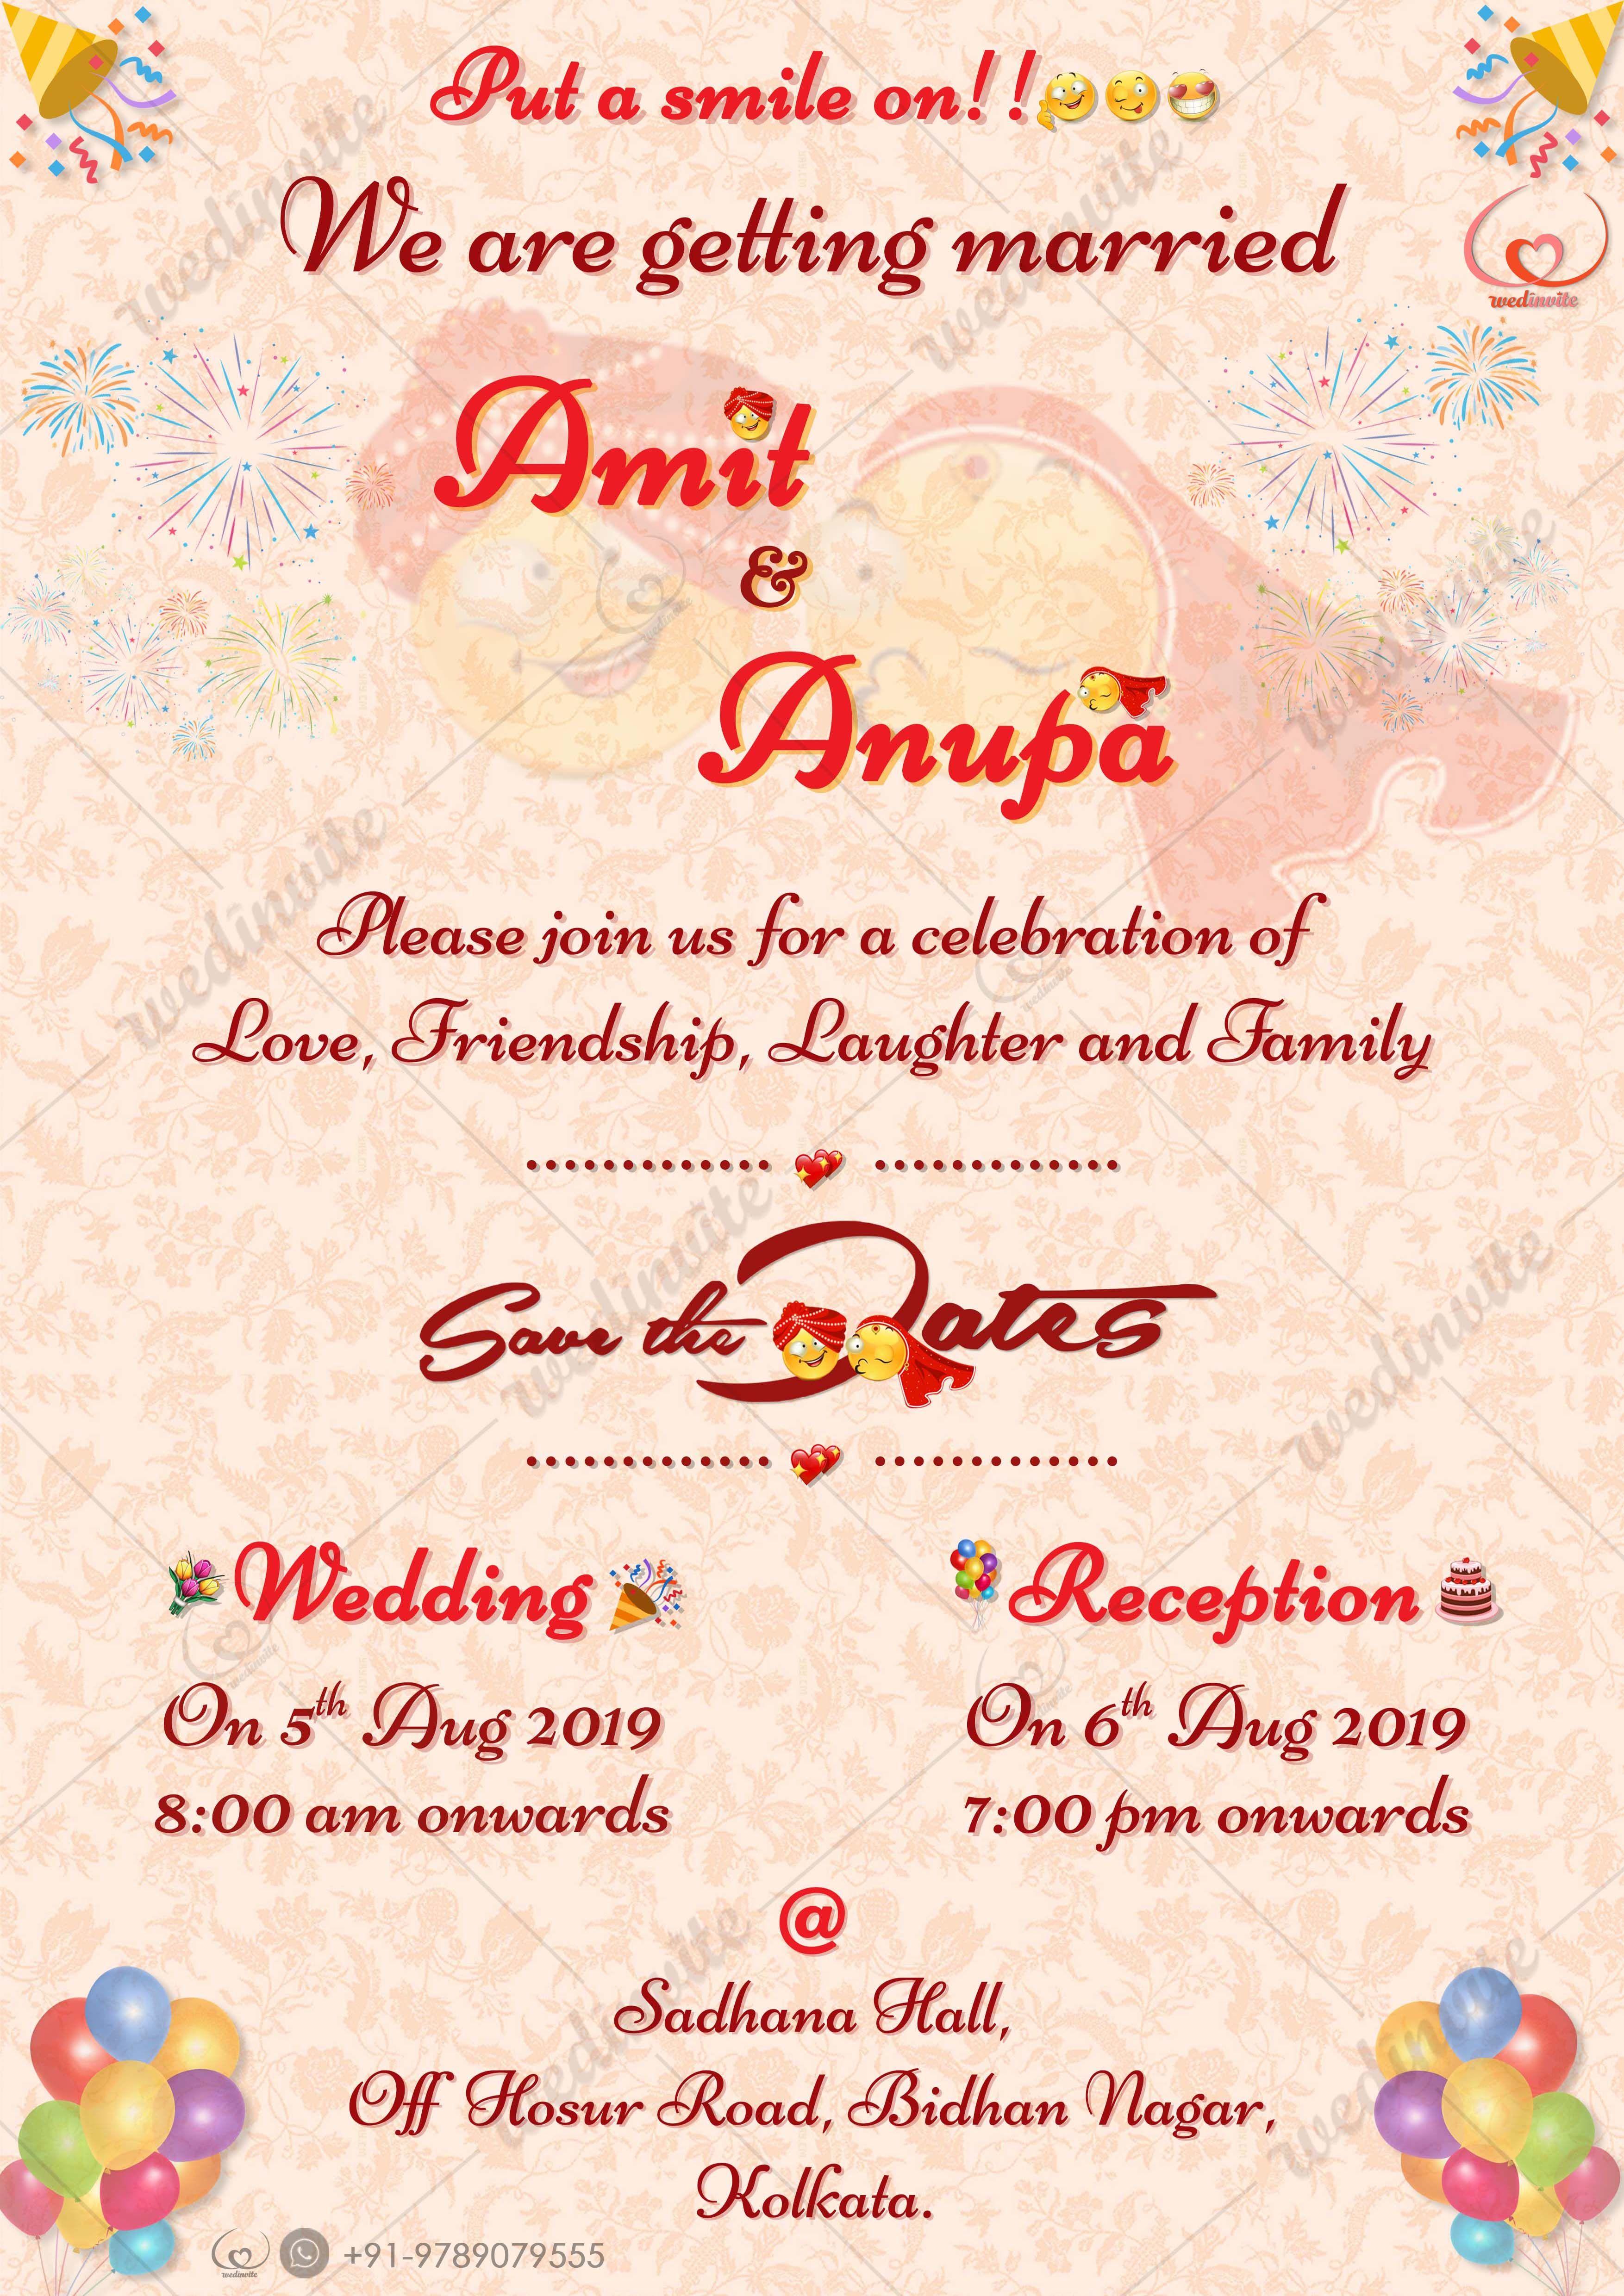 Smiley Invitation Card Wedding Card Wordings Indian Wedding Invitation Cards Digital Weddings